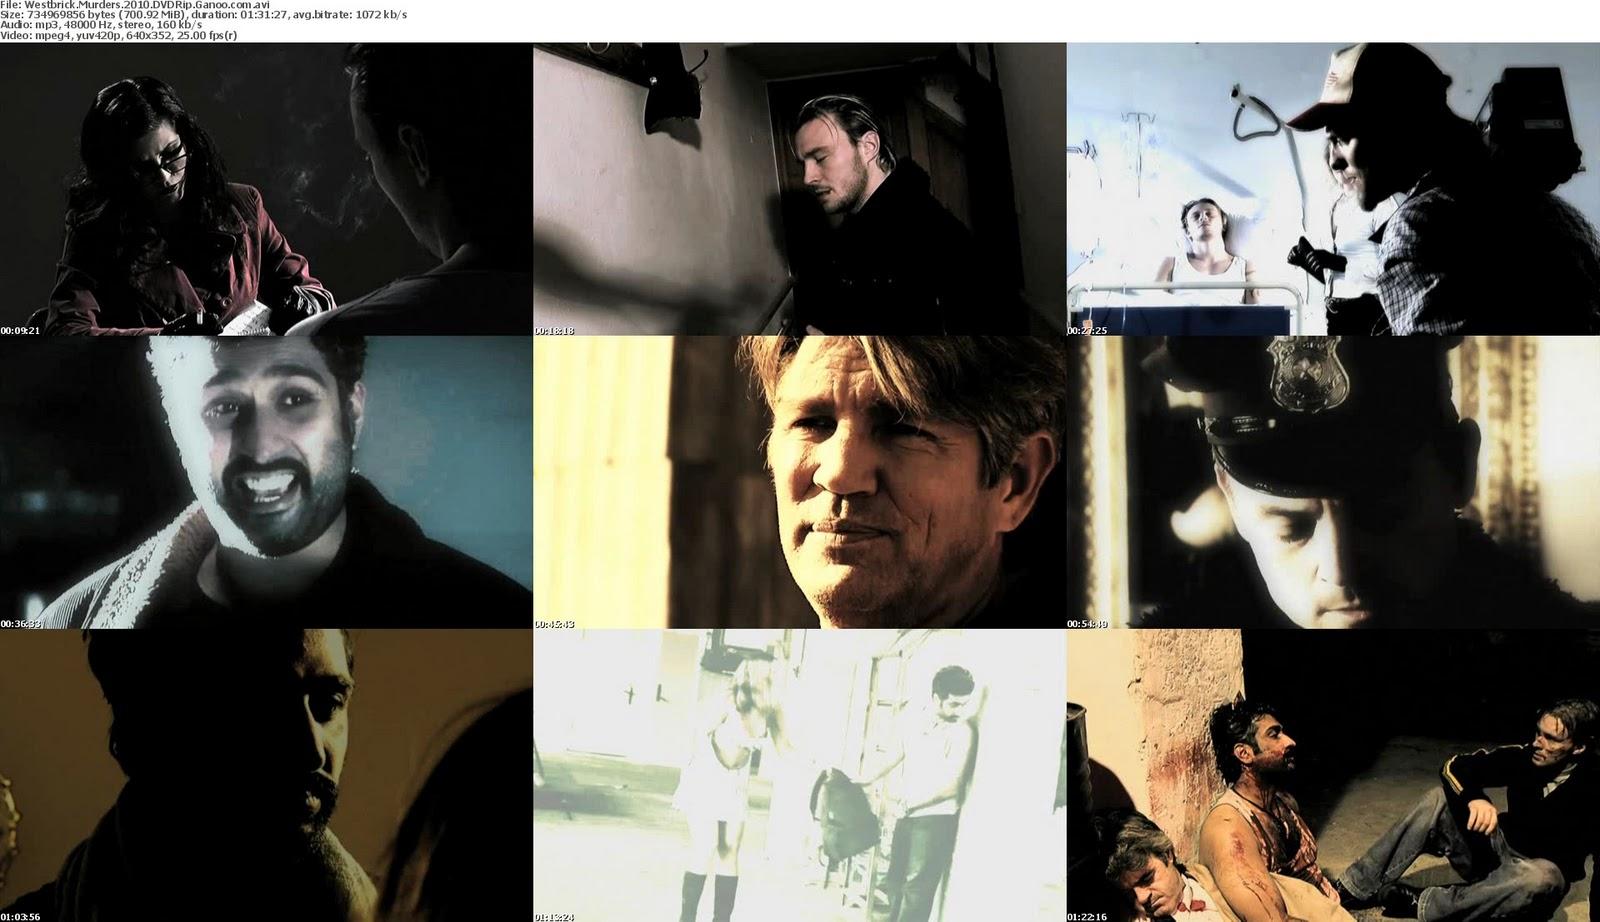 http://1.bp.blogspot.com/_RvtUEY2b-mI/TNt5fVNedpI/AAAAAAAABko/6hppn5J_t6c/s1600/Westbrick+Murders+Screen.jpg